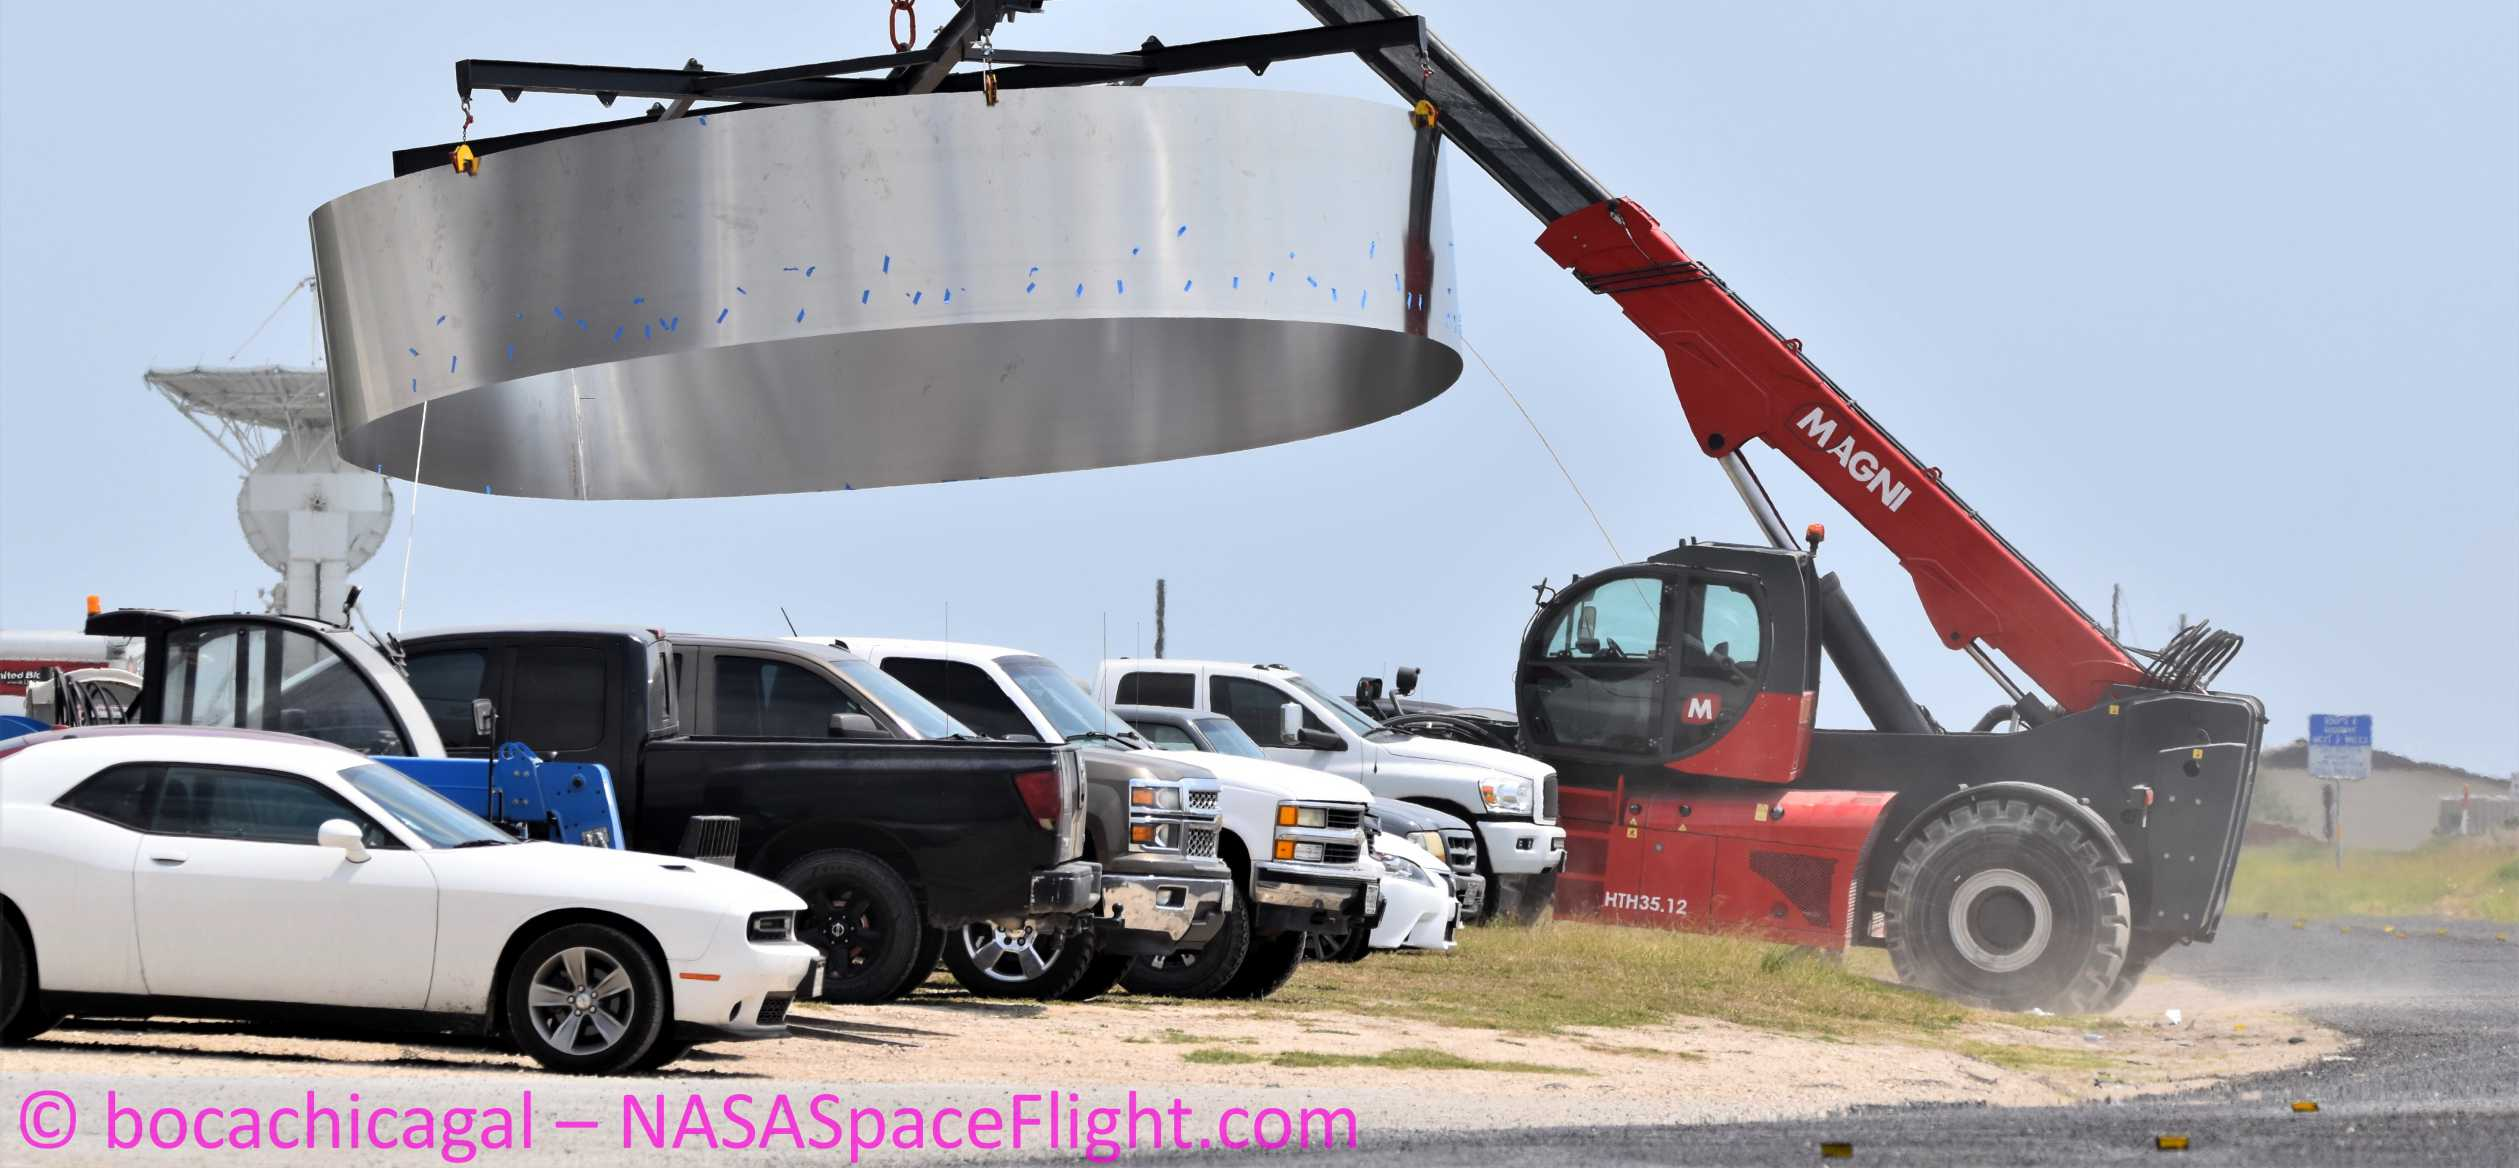 Starship Boca Chica 050620 (NASASpaceflight – bocachicagal) SN6 ring work 3 crop 2 (c)